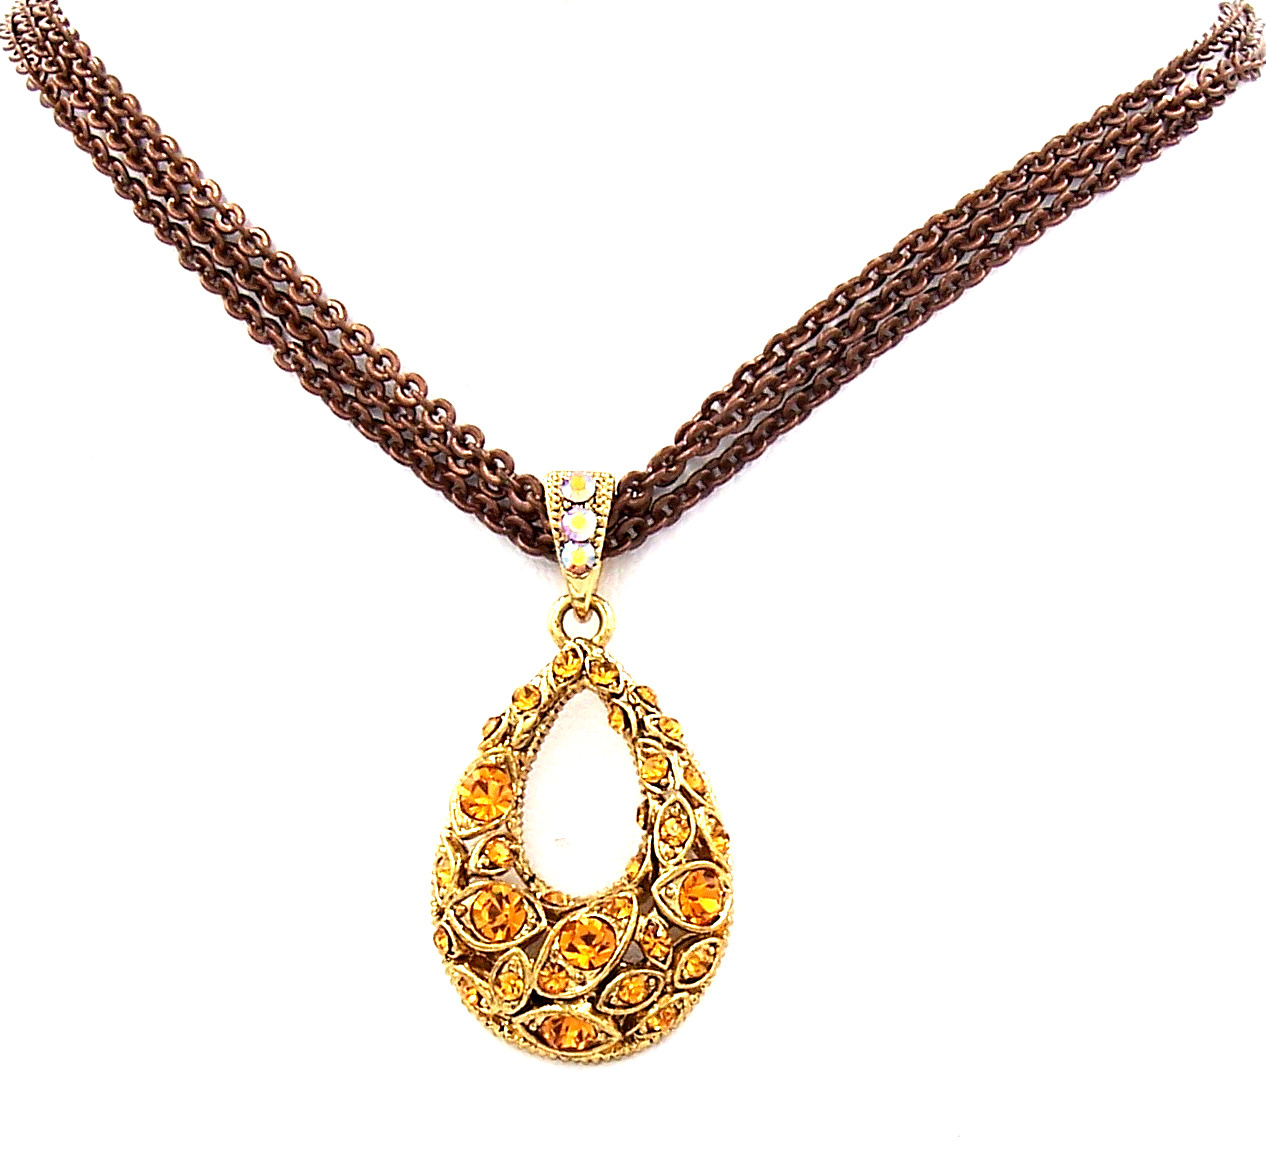 Swarovski Element Crystal New Gold Topaz Oval Pendant Necklace Earrings Gift Set